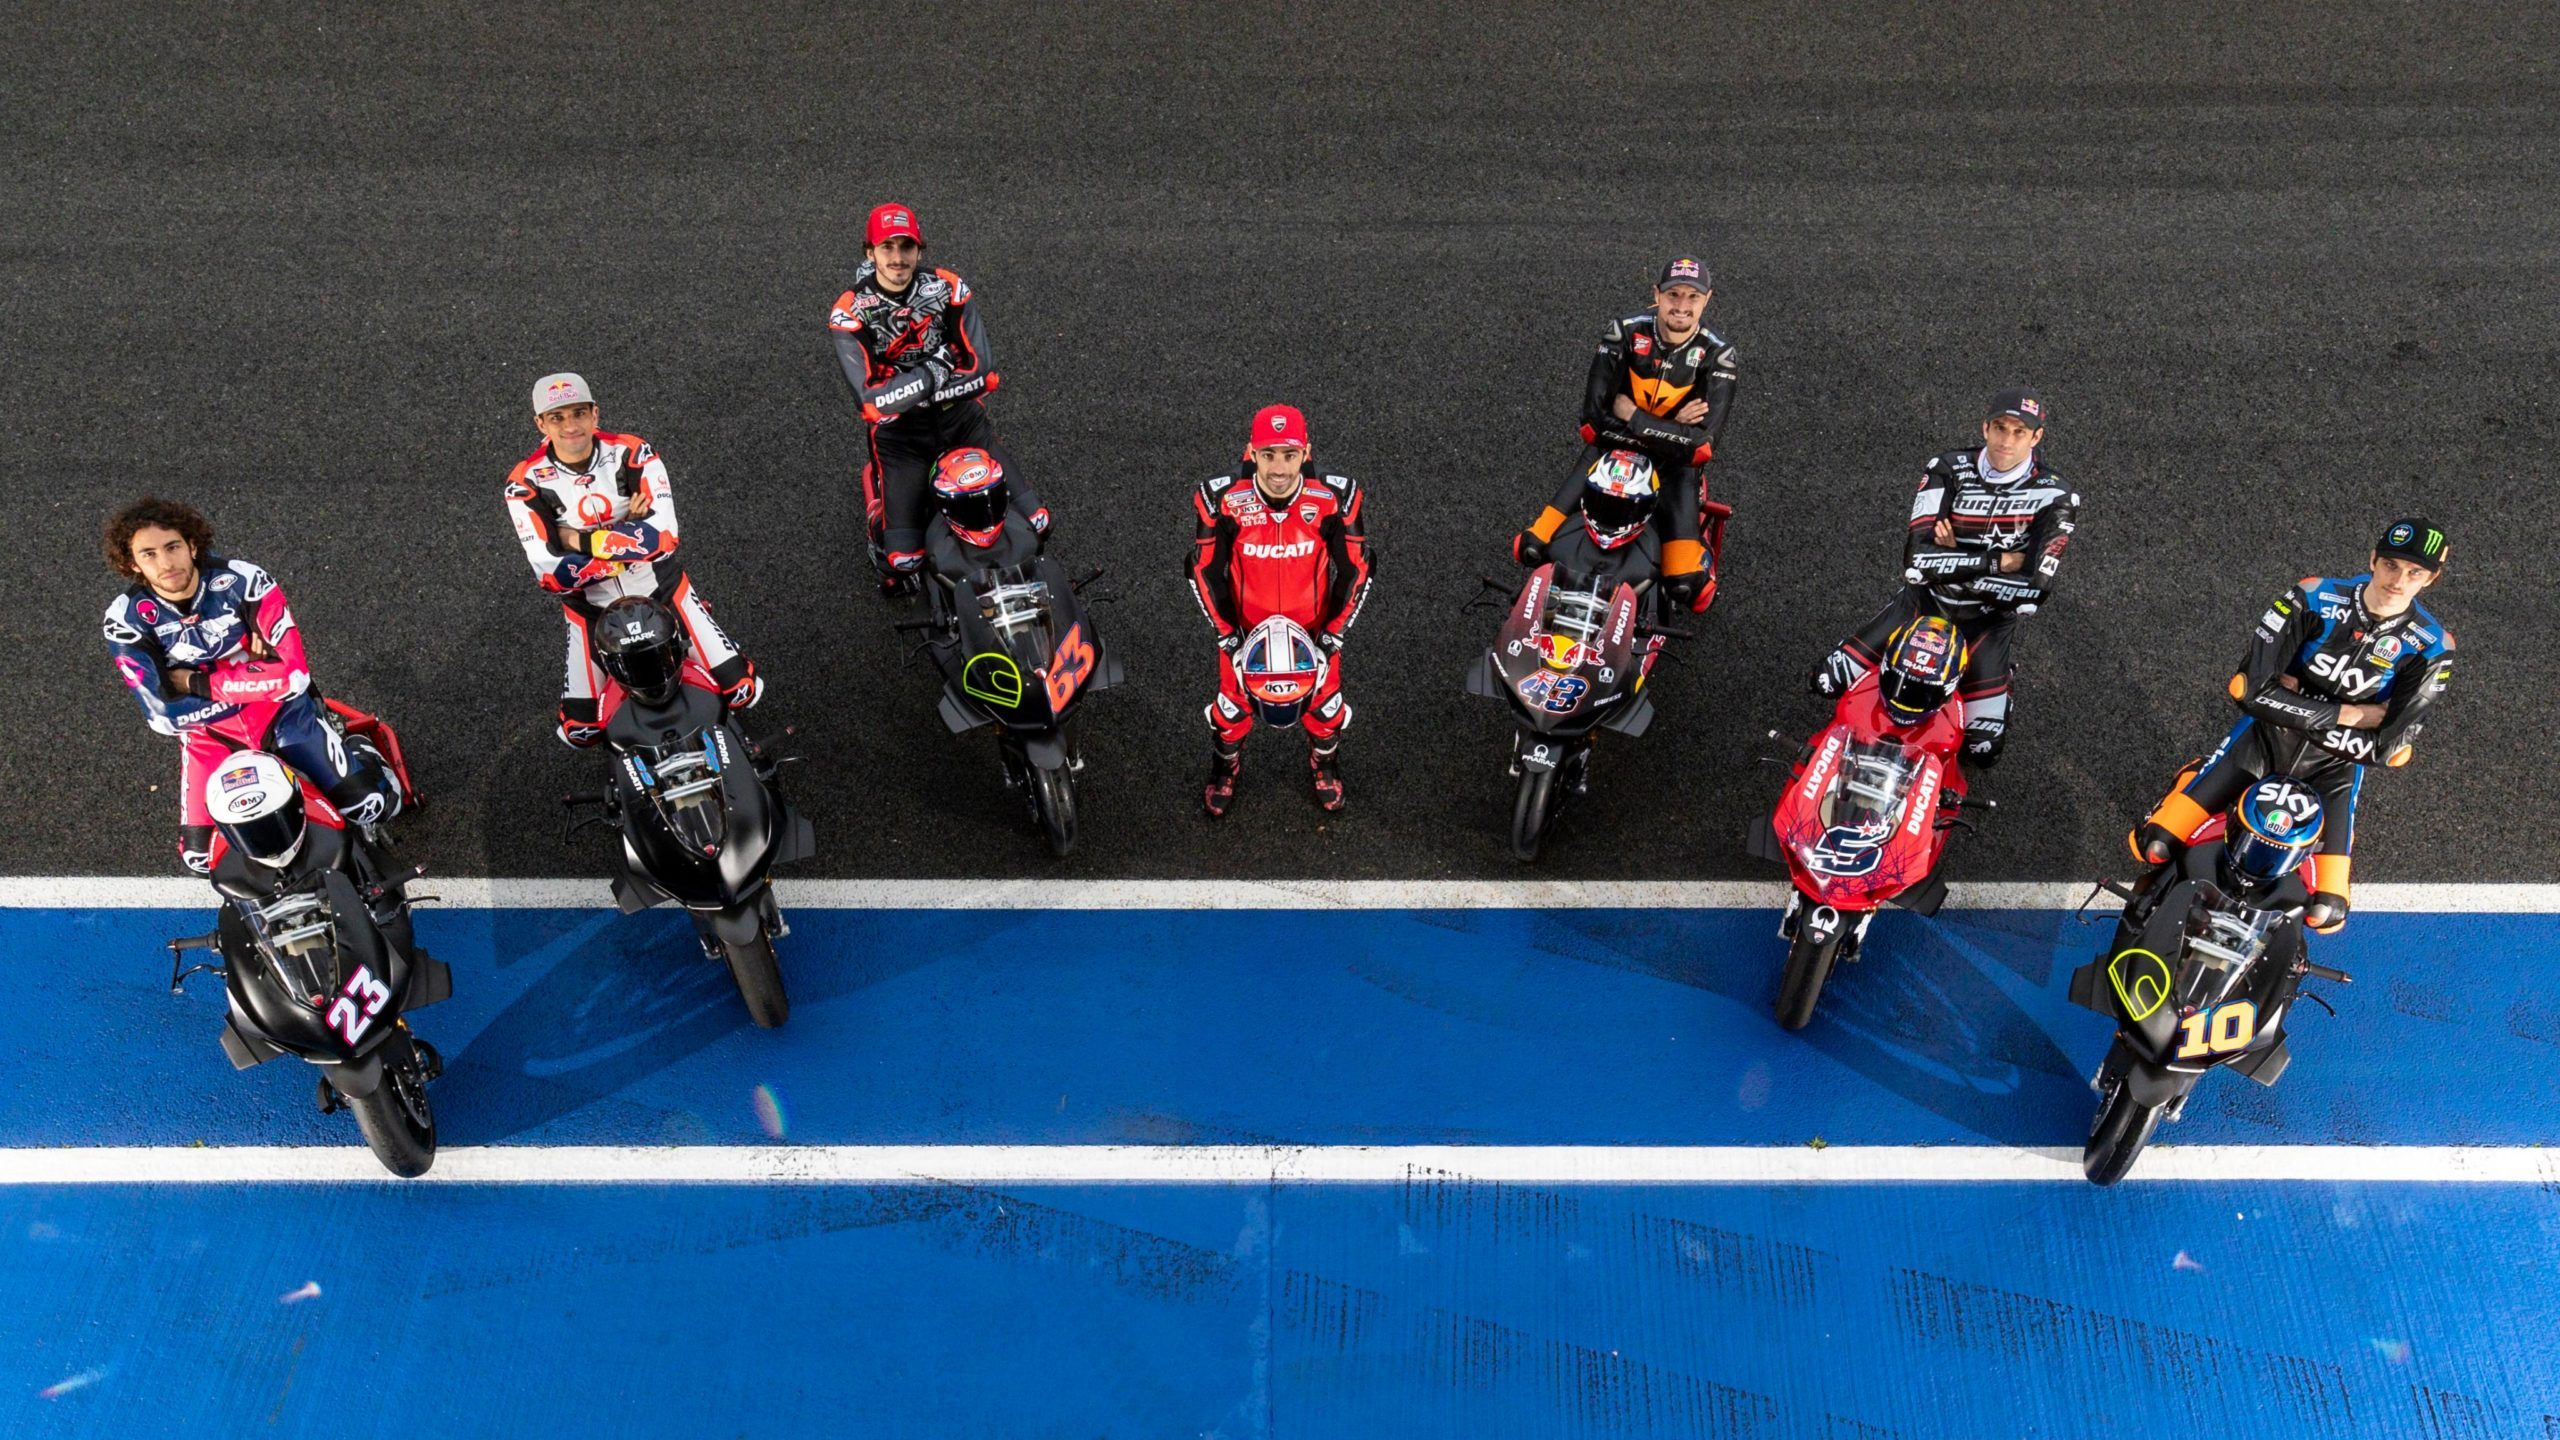 Ducati, Michele Pirro, MotoGP